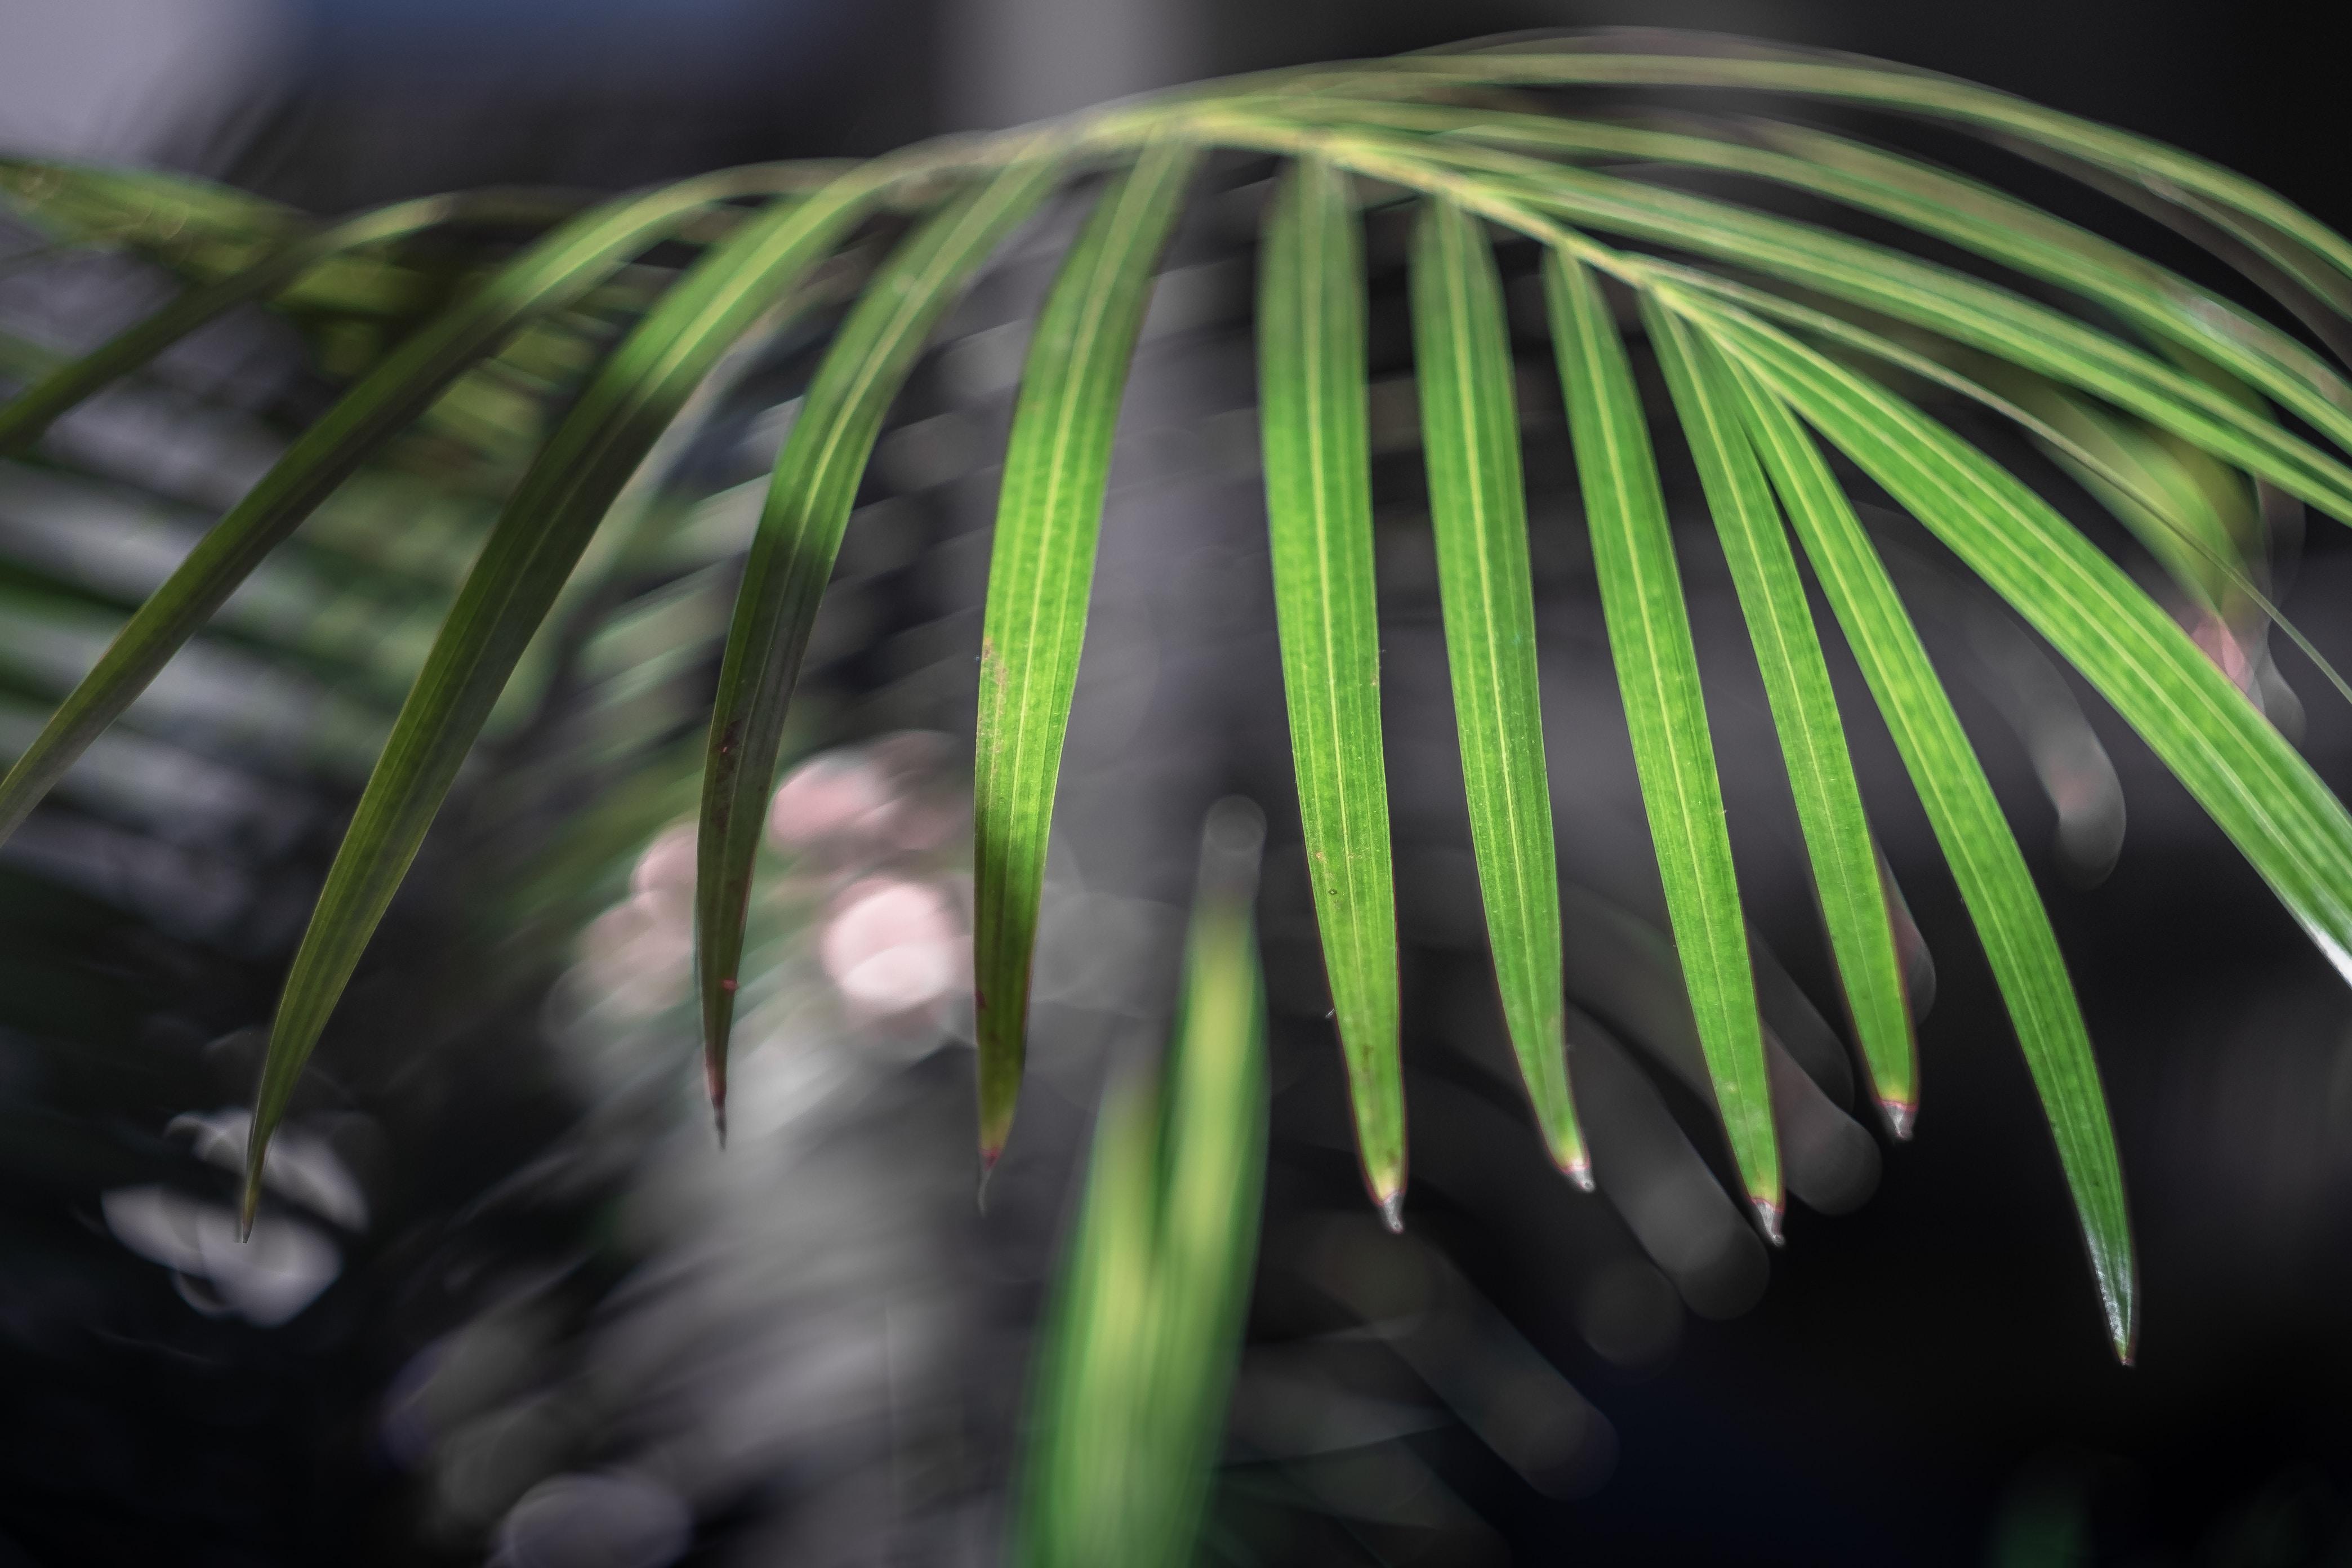 green lefaed plant